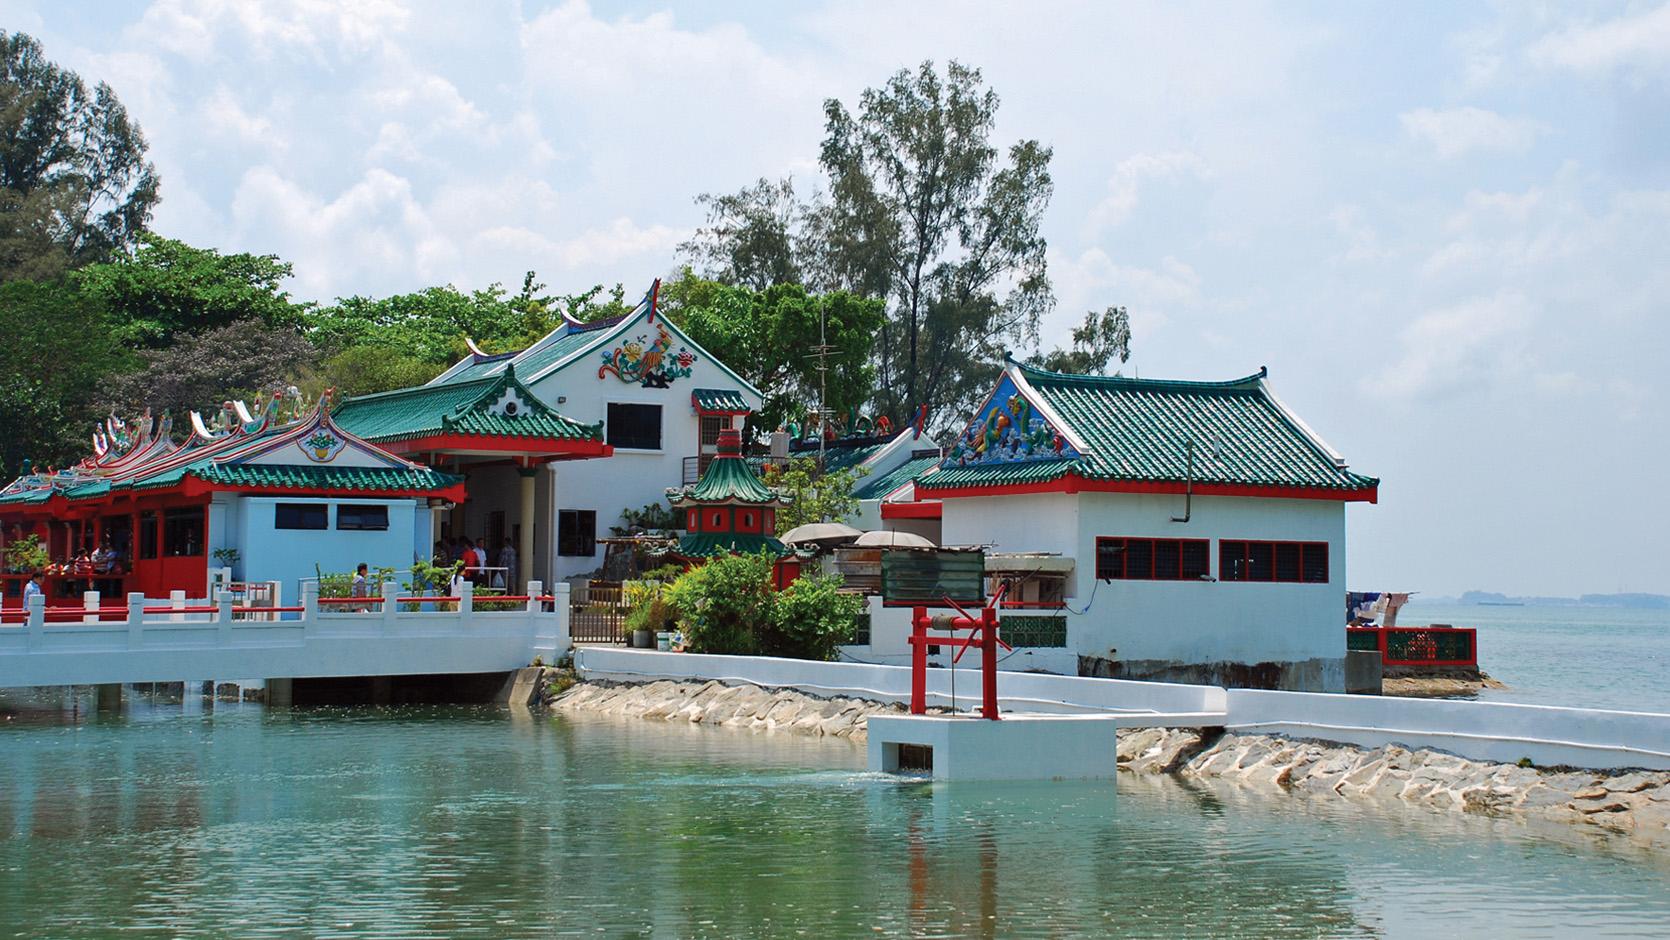 EDUTECH ASIA 2017 Kusu island